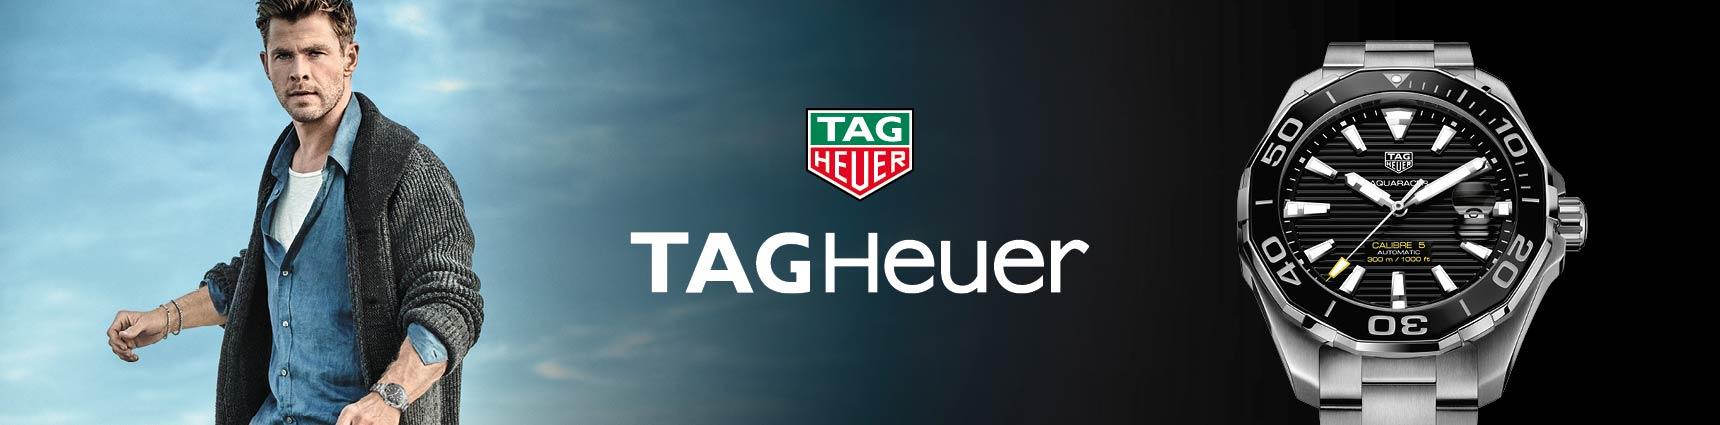 tag-heuer-watches-nuneaton